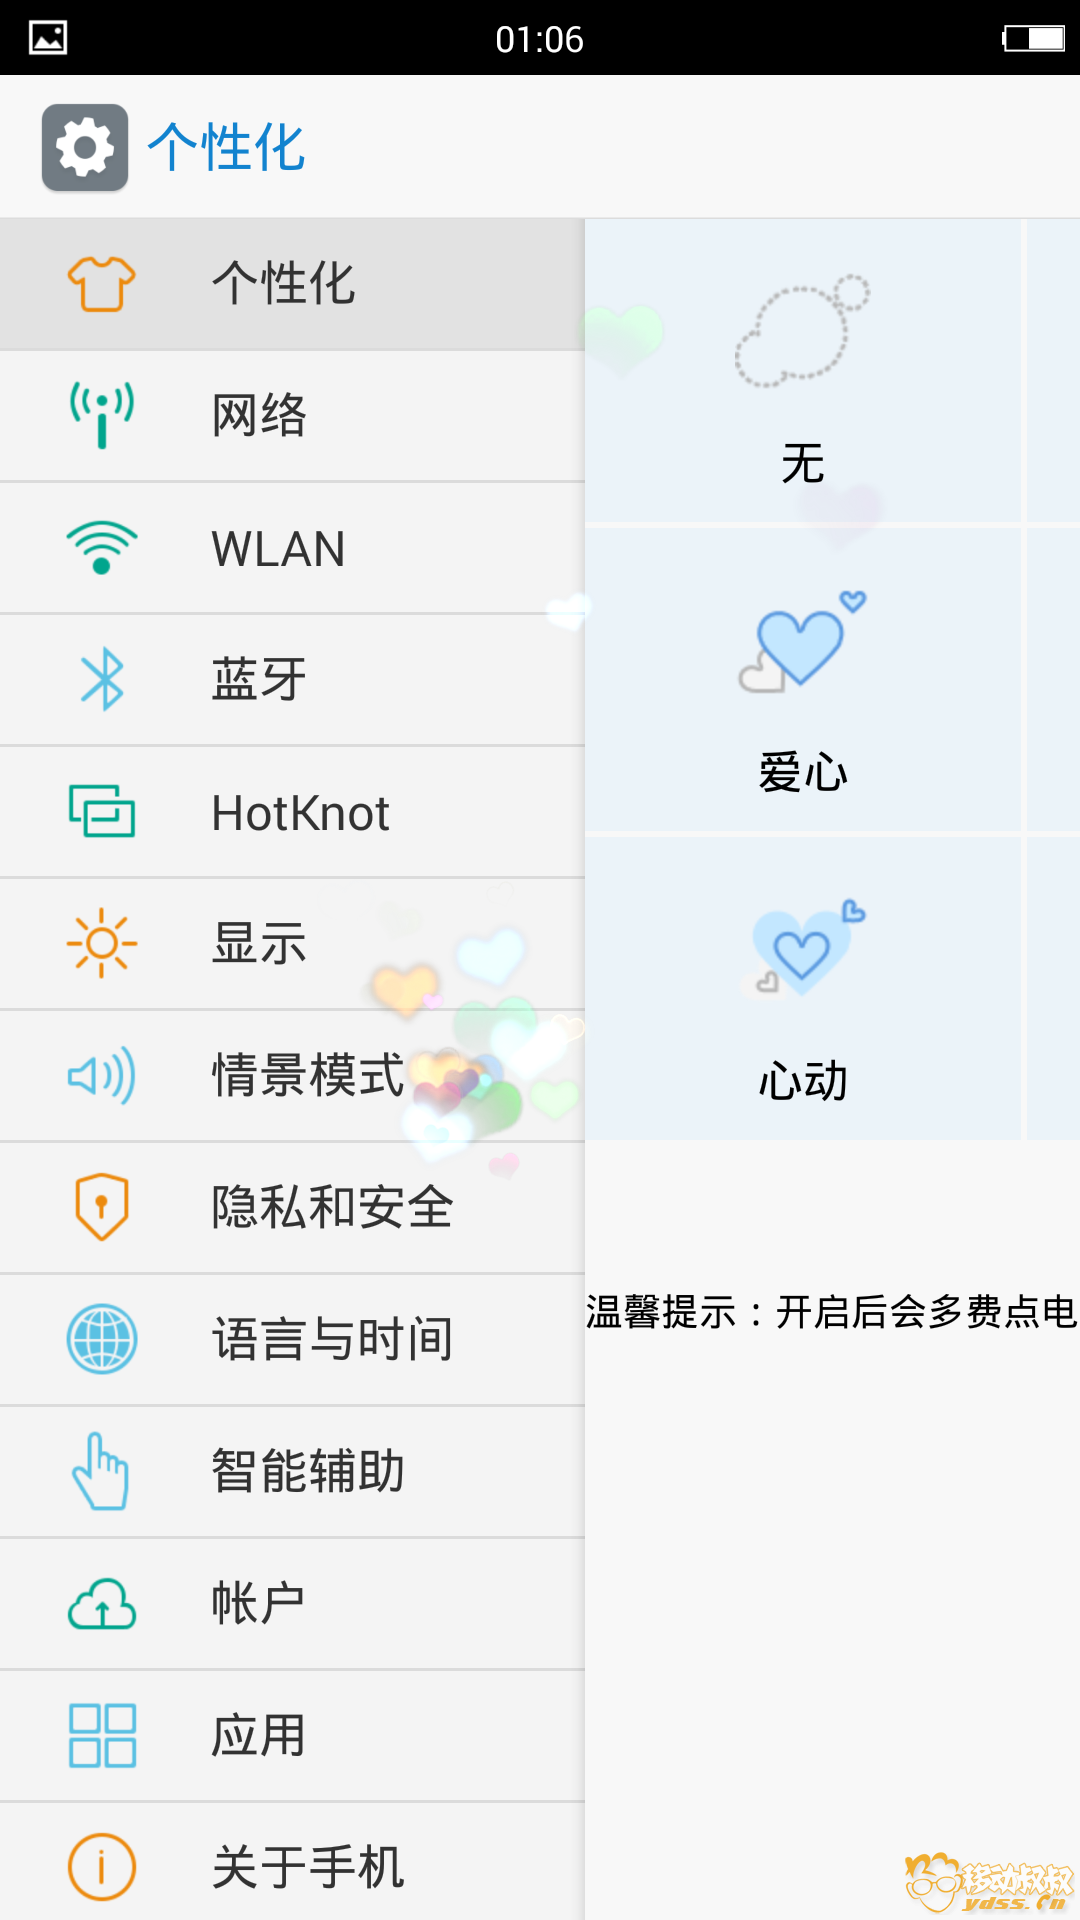 Screenshot_2014-01-01-01-06-56.png